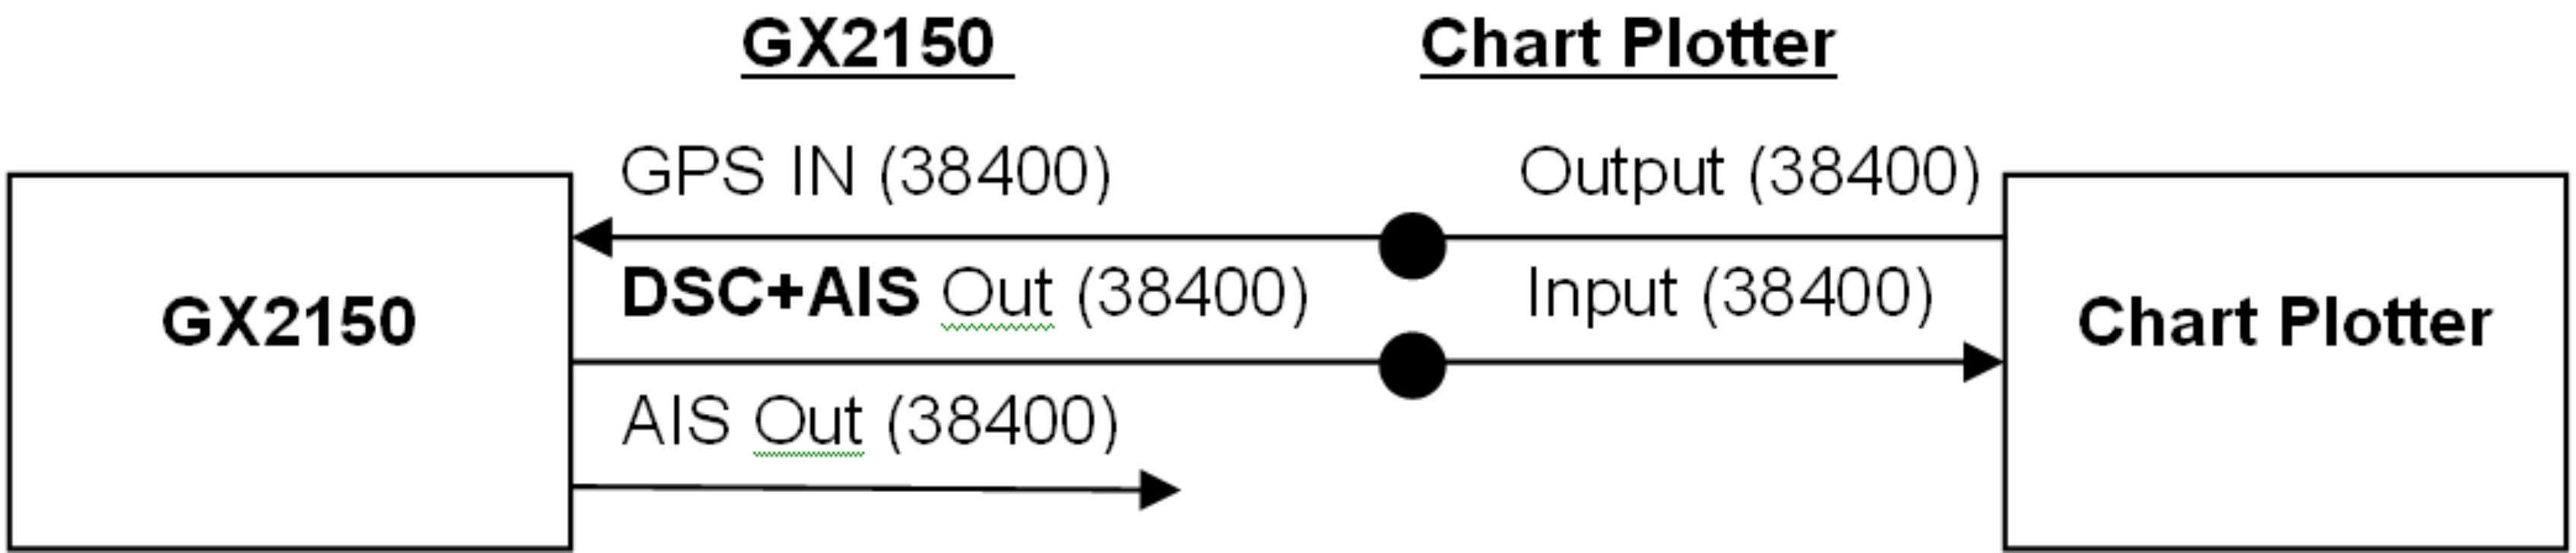 GX2150 web page wiring diagram?resize\\\\\\\\\\\\\\\\\\\\\\\\\\\\\\\=665%2C143 3206 cub cadet wiring diagram wiring diagrams  at gsmportal.co